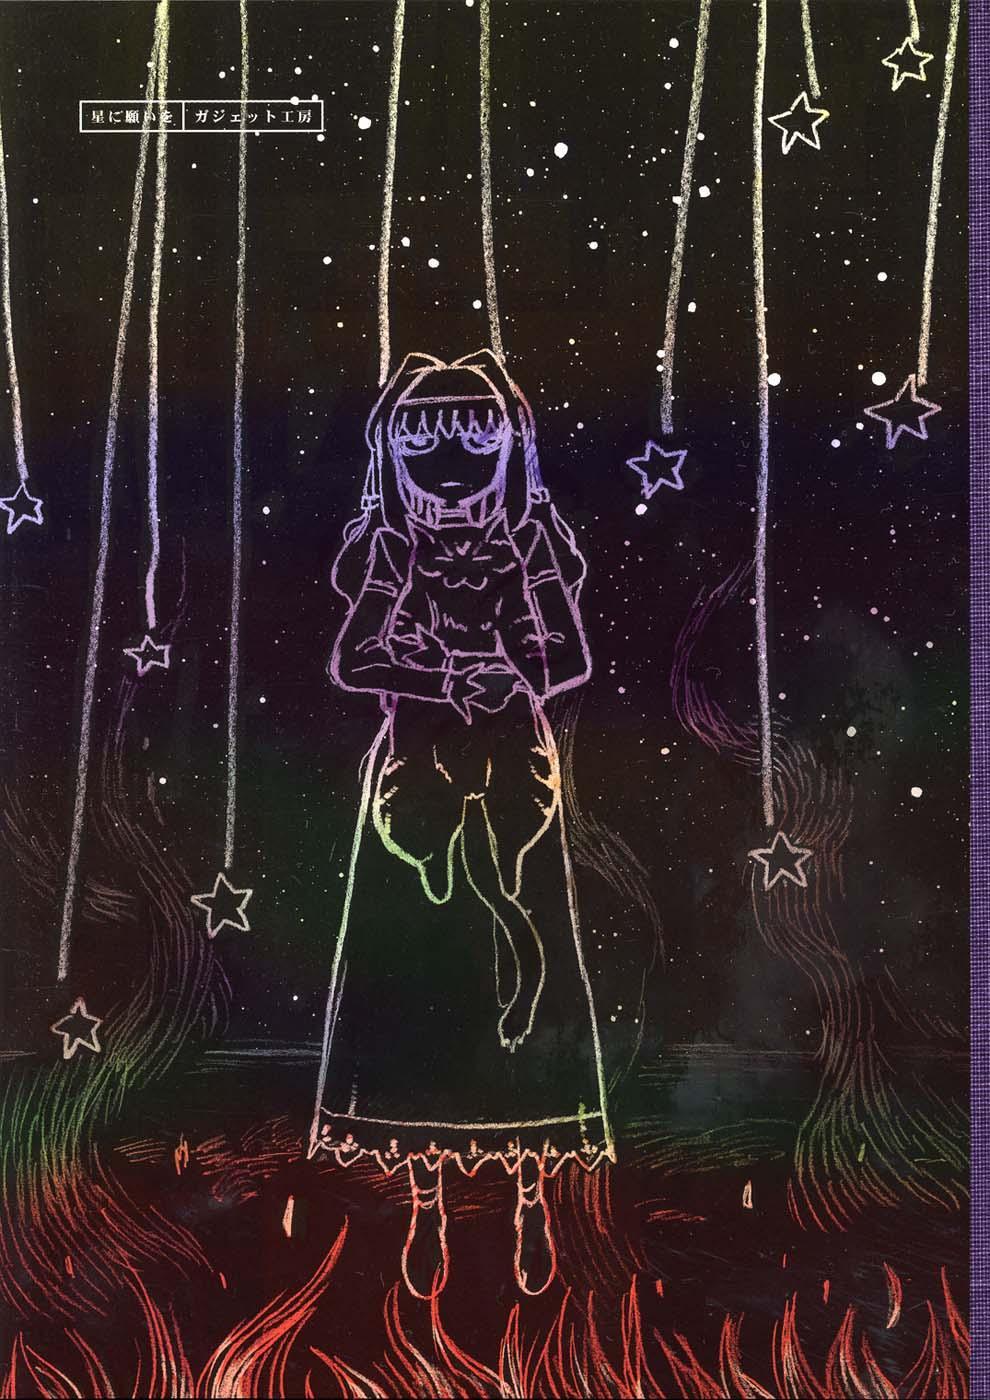 Hoshi ni negai wo   Wish Upon a Star 0